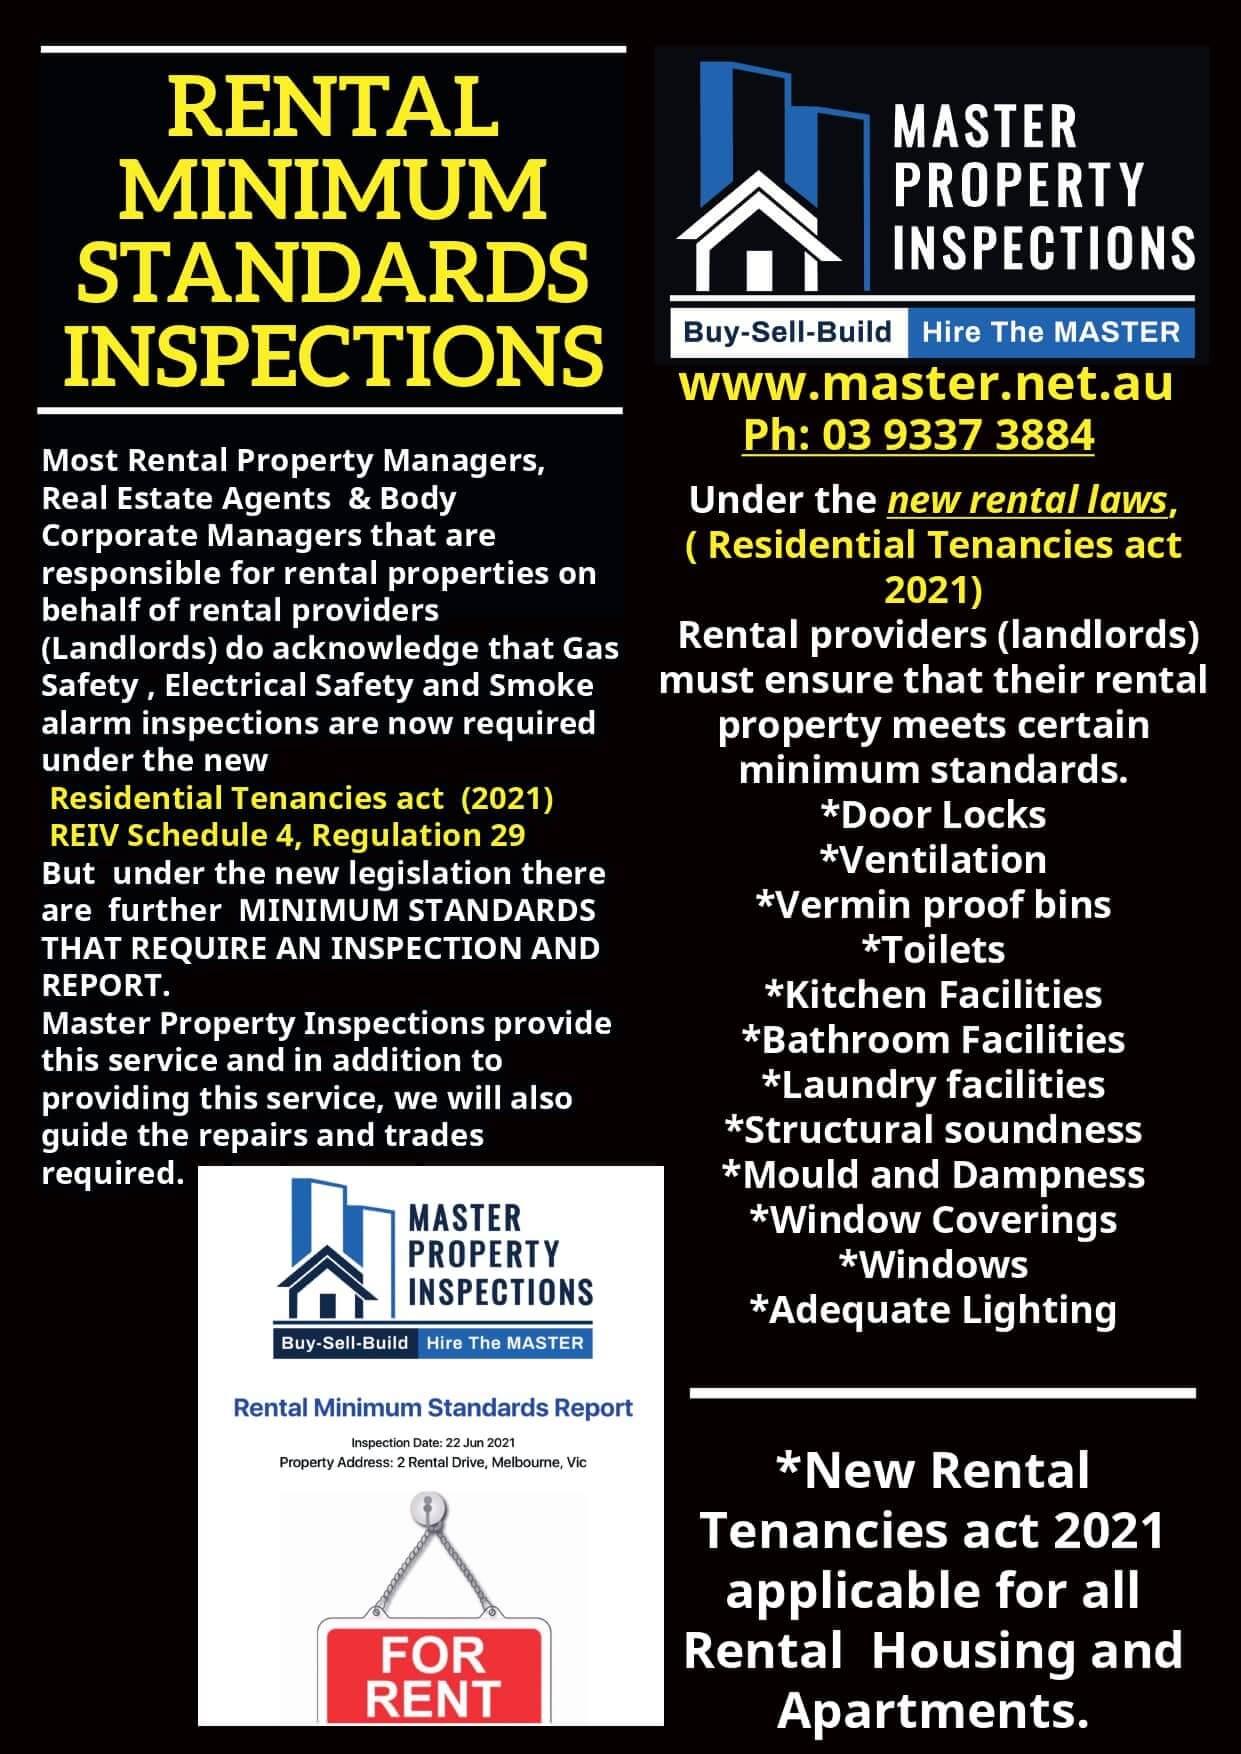 rental-minimum-standards-inspections.jpg